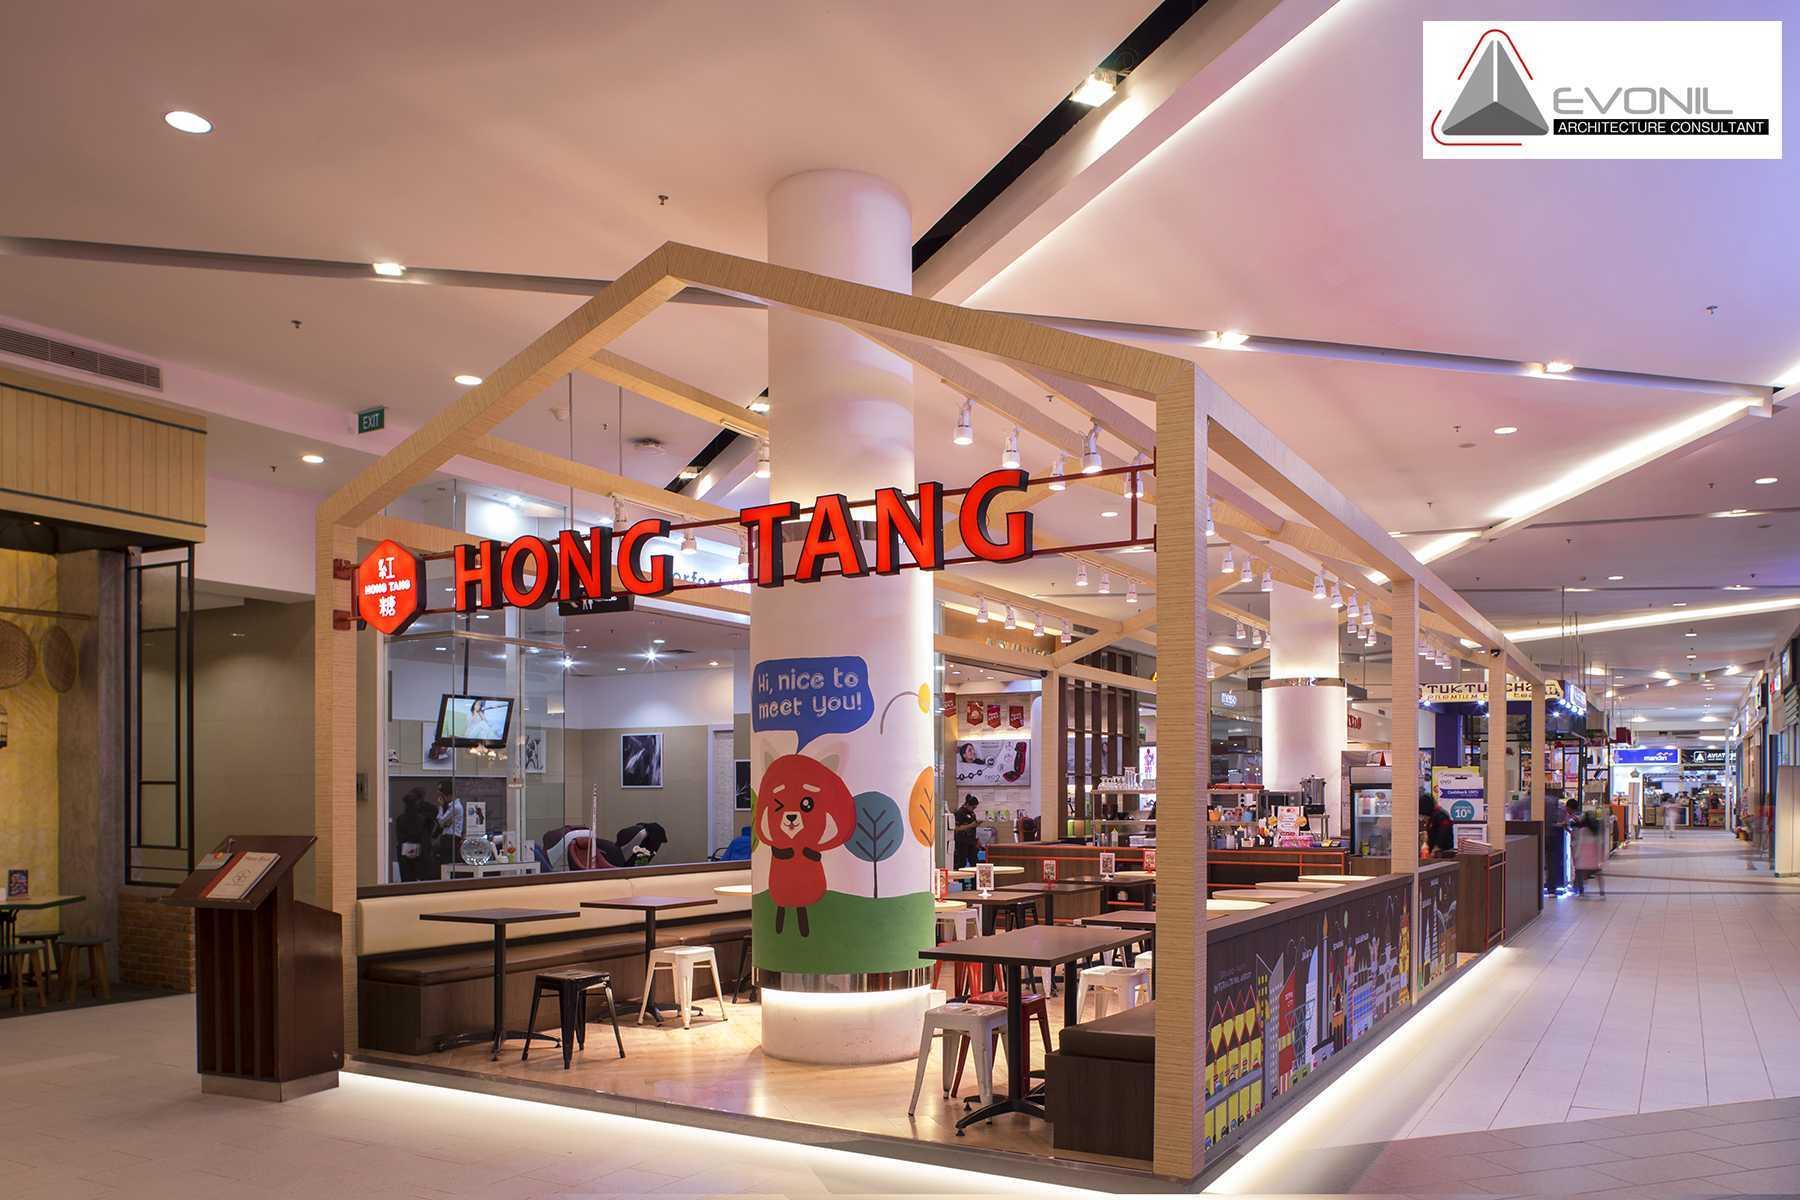 Evonil Architecture Hong Tang Dessert Cafe - Gandaria City Mall Jakarta, Daerah Khusus Ibukota Jakarta, Indonesia Jakarta, Daerah Khusus Ibukota Jakarta, Indonesia Evonil-Architecture-Hong-Tang-Dessert-Cafe-Gandaria-City-Mall  61378